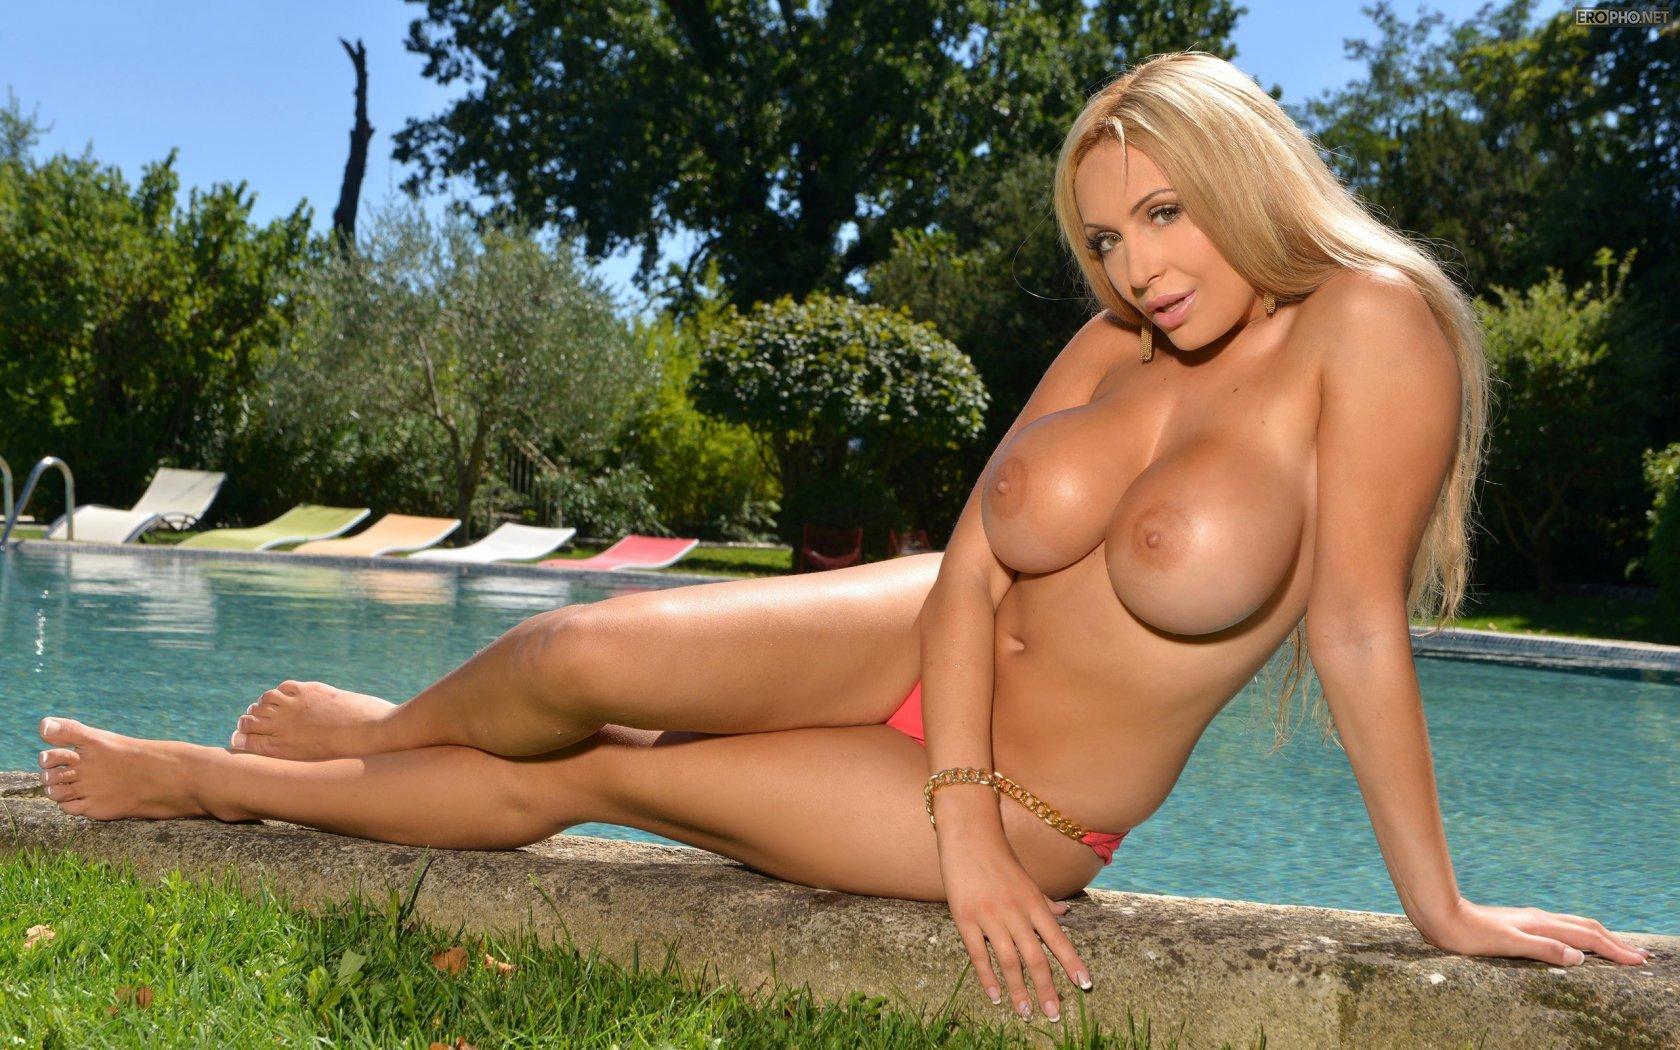 Playboy Blonde Nude Models, Busty Blondes